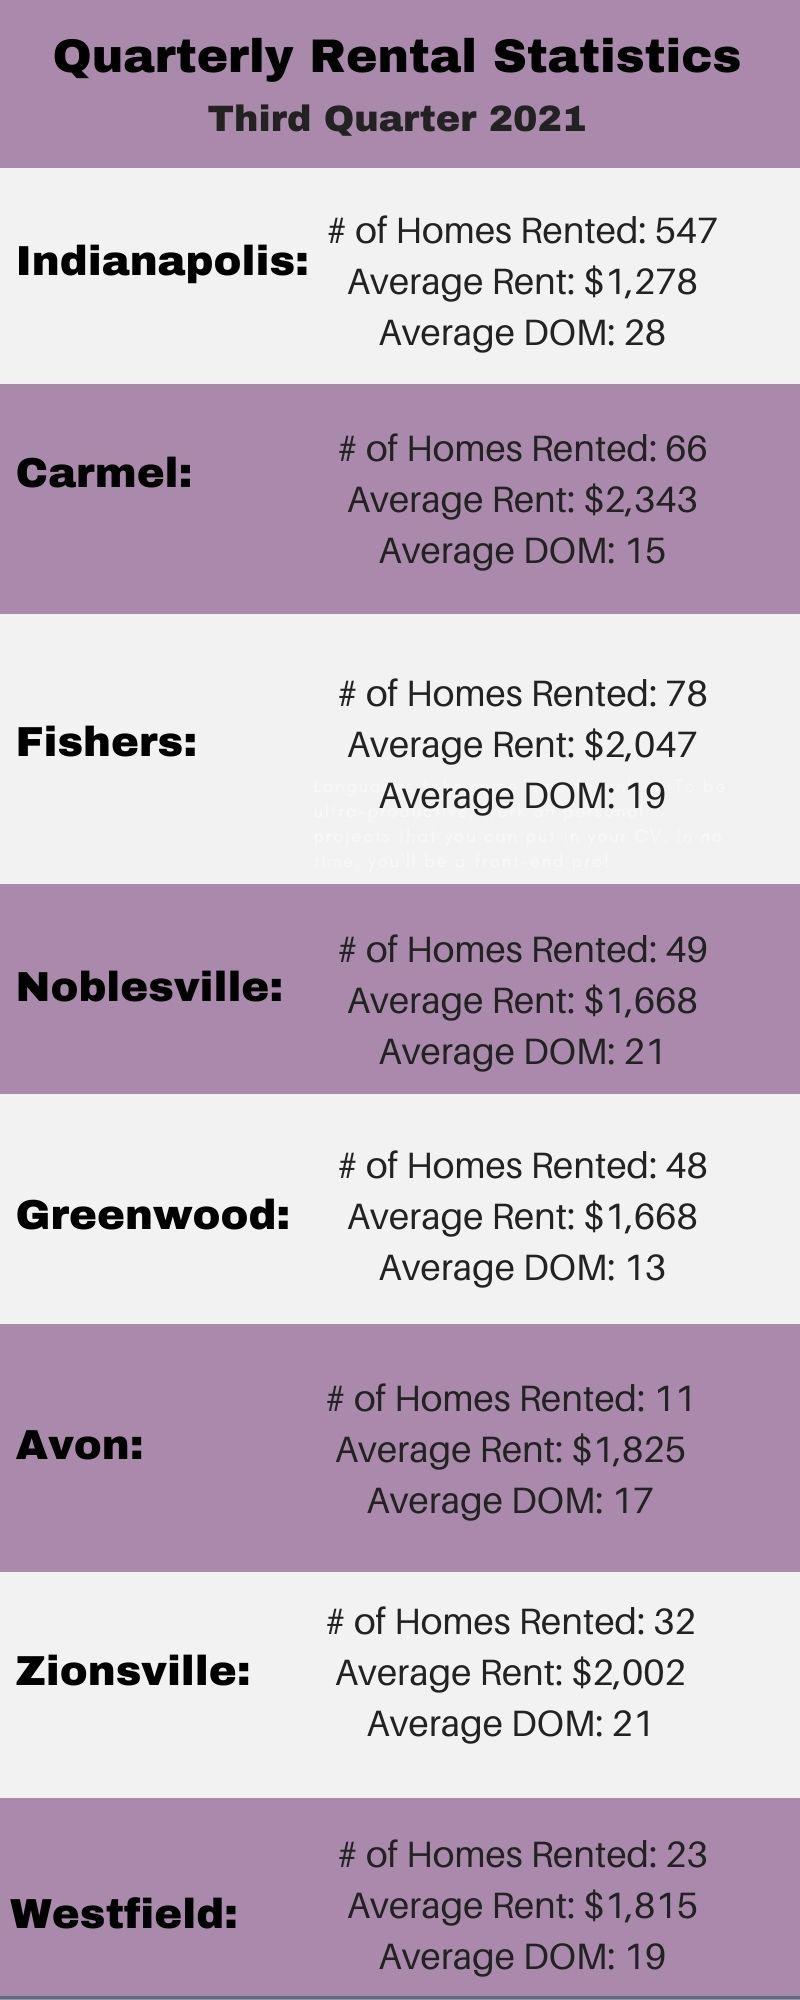 Rental statistics quarter 3